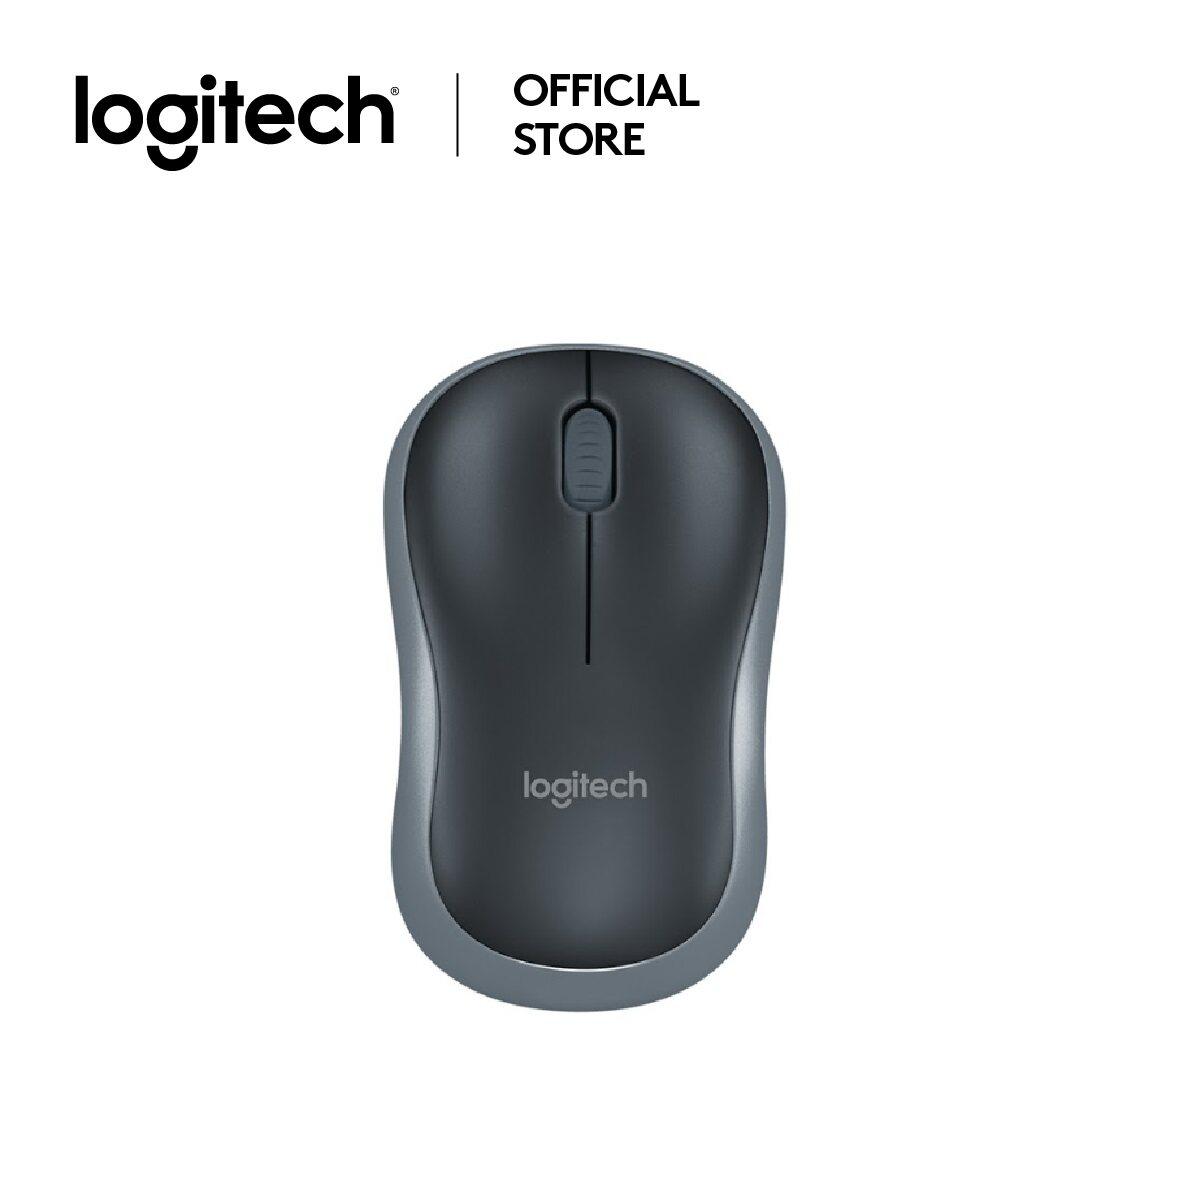 Logitech Mouse Wireless M185 เชื่อมต่อไร้สาย 2.4ghz, Dpi 1000, ระยะการเชื่อมต่อไร้สาย 10 เมตร, Port Usb (m185_cordless_ms) ( เมาส์).